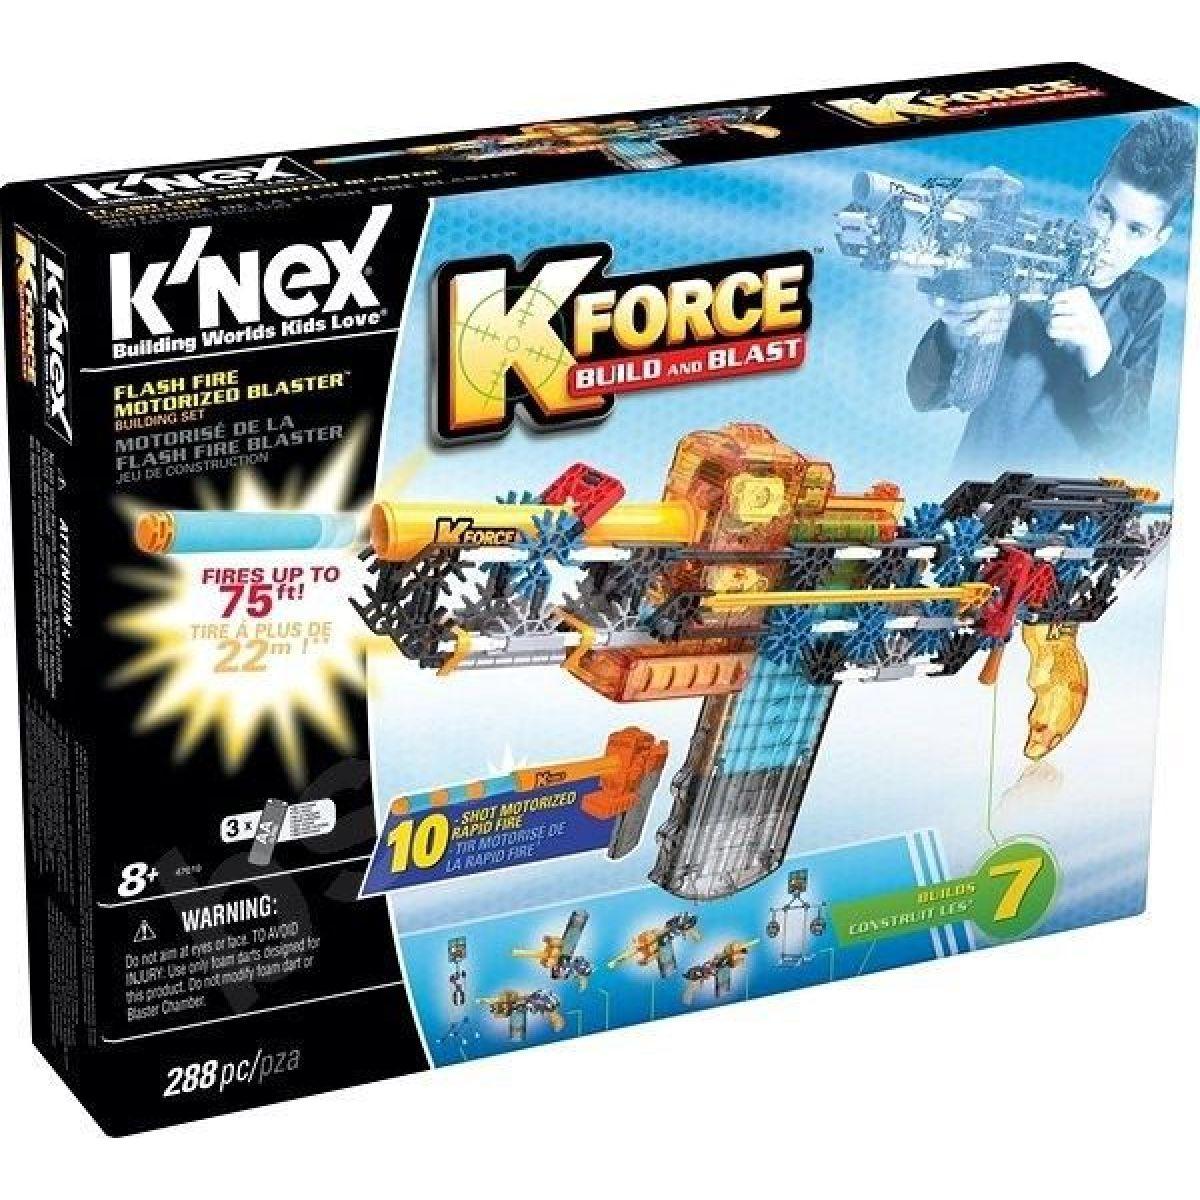 Knex Stavebnice Flash Fire Blaster